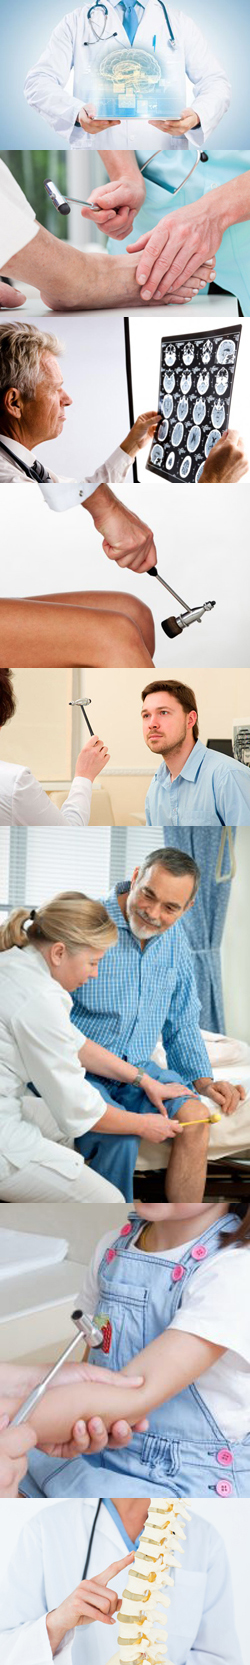 Что лечит врач невролог вегетолог